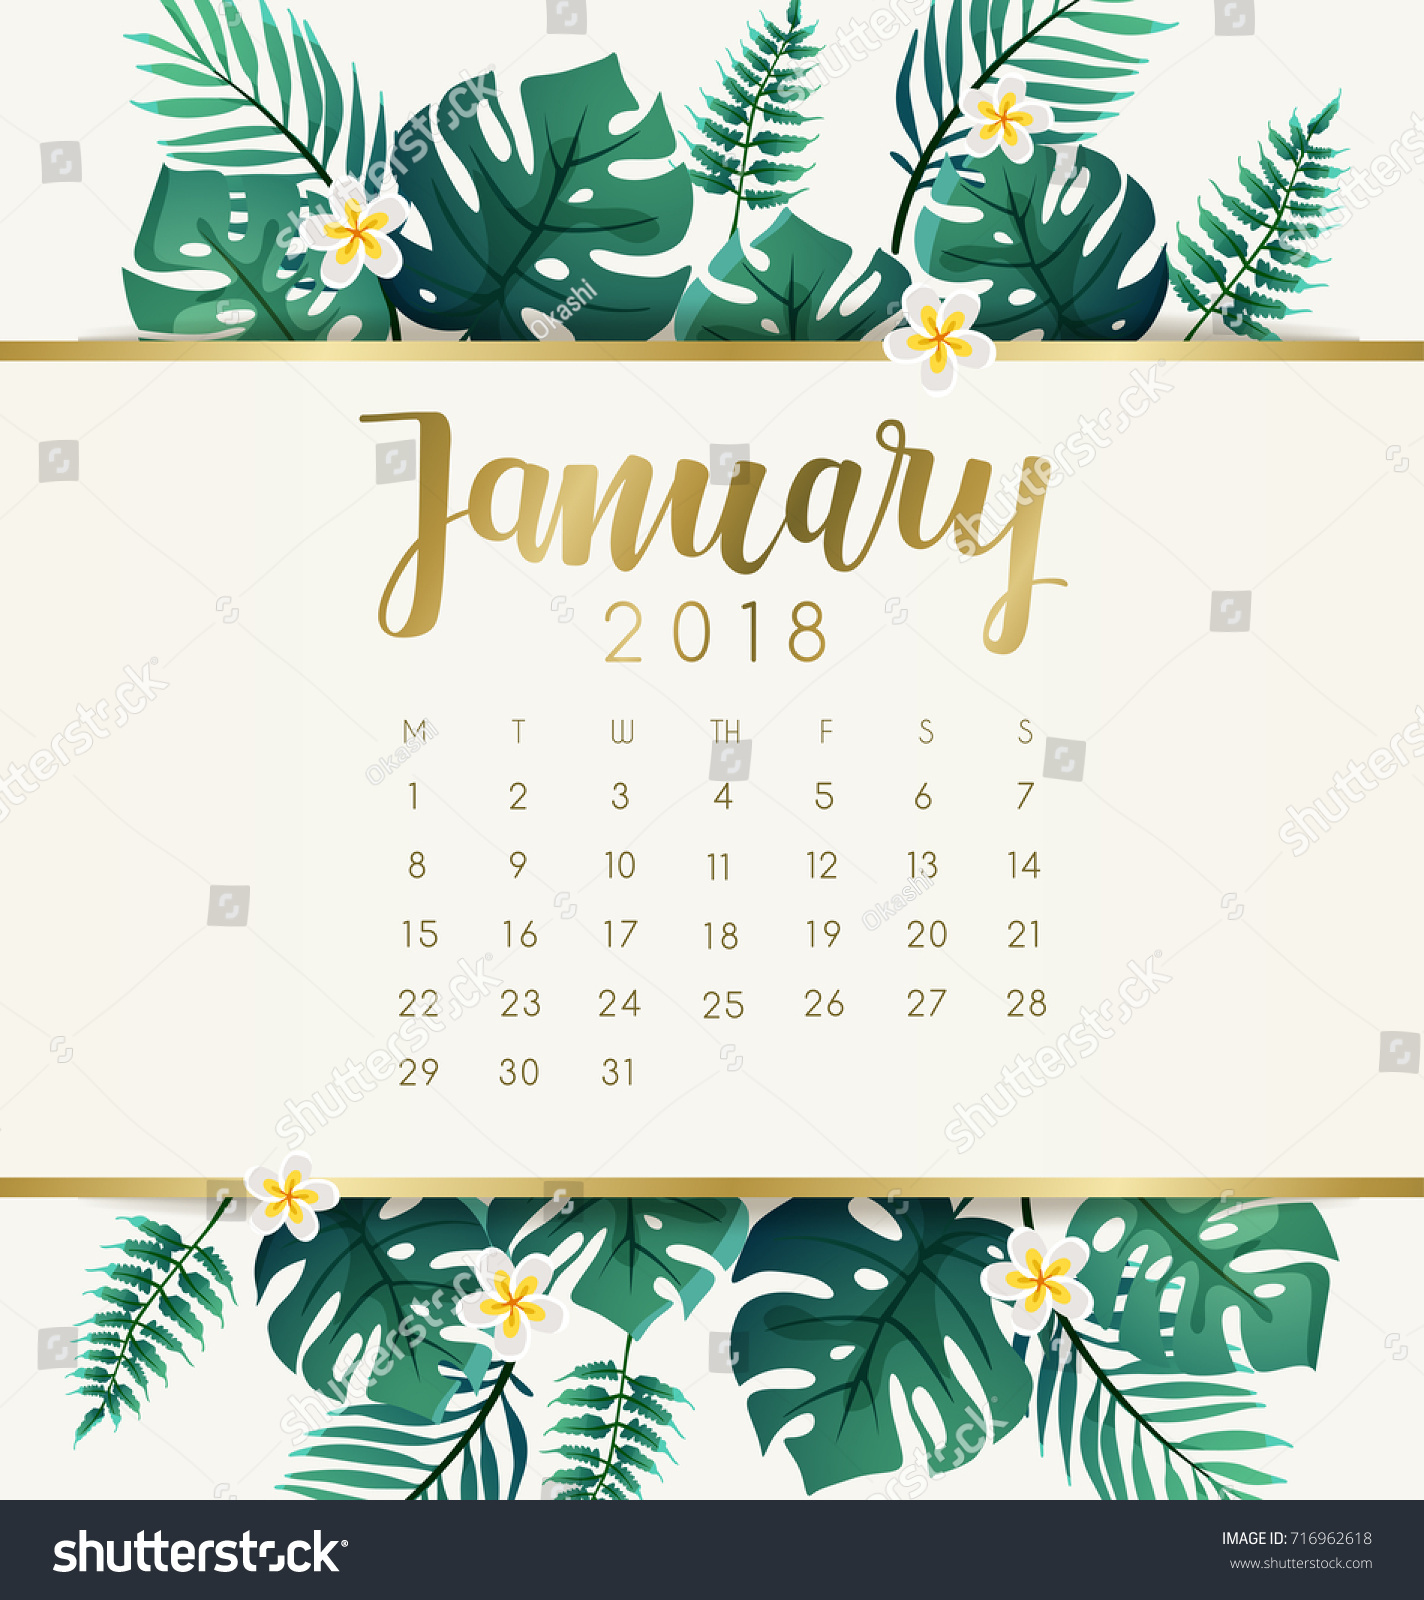 january 2018 calendar template exotic tropical のベクター画像素材